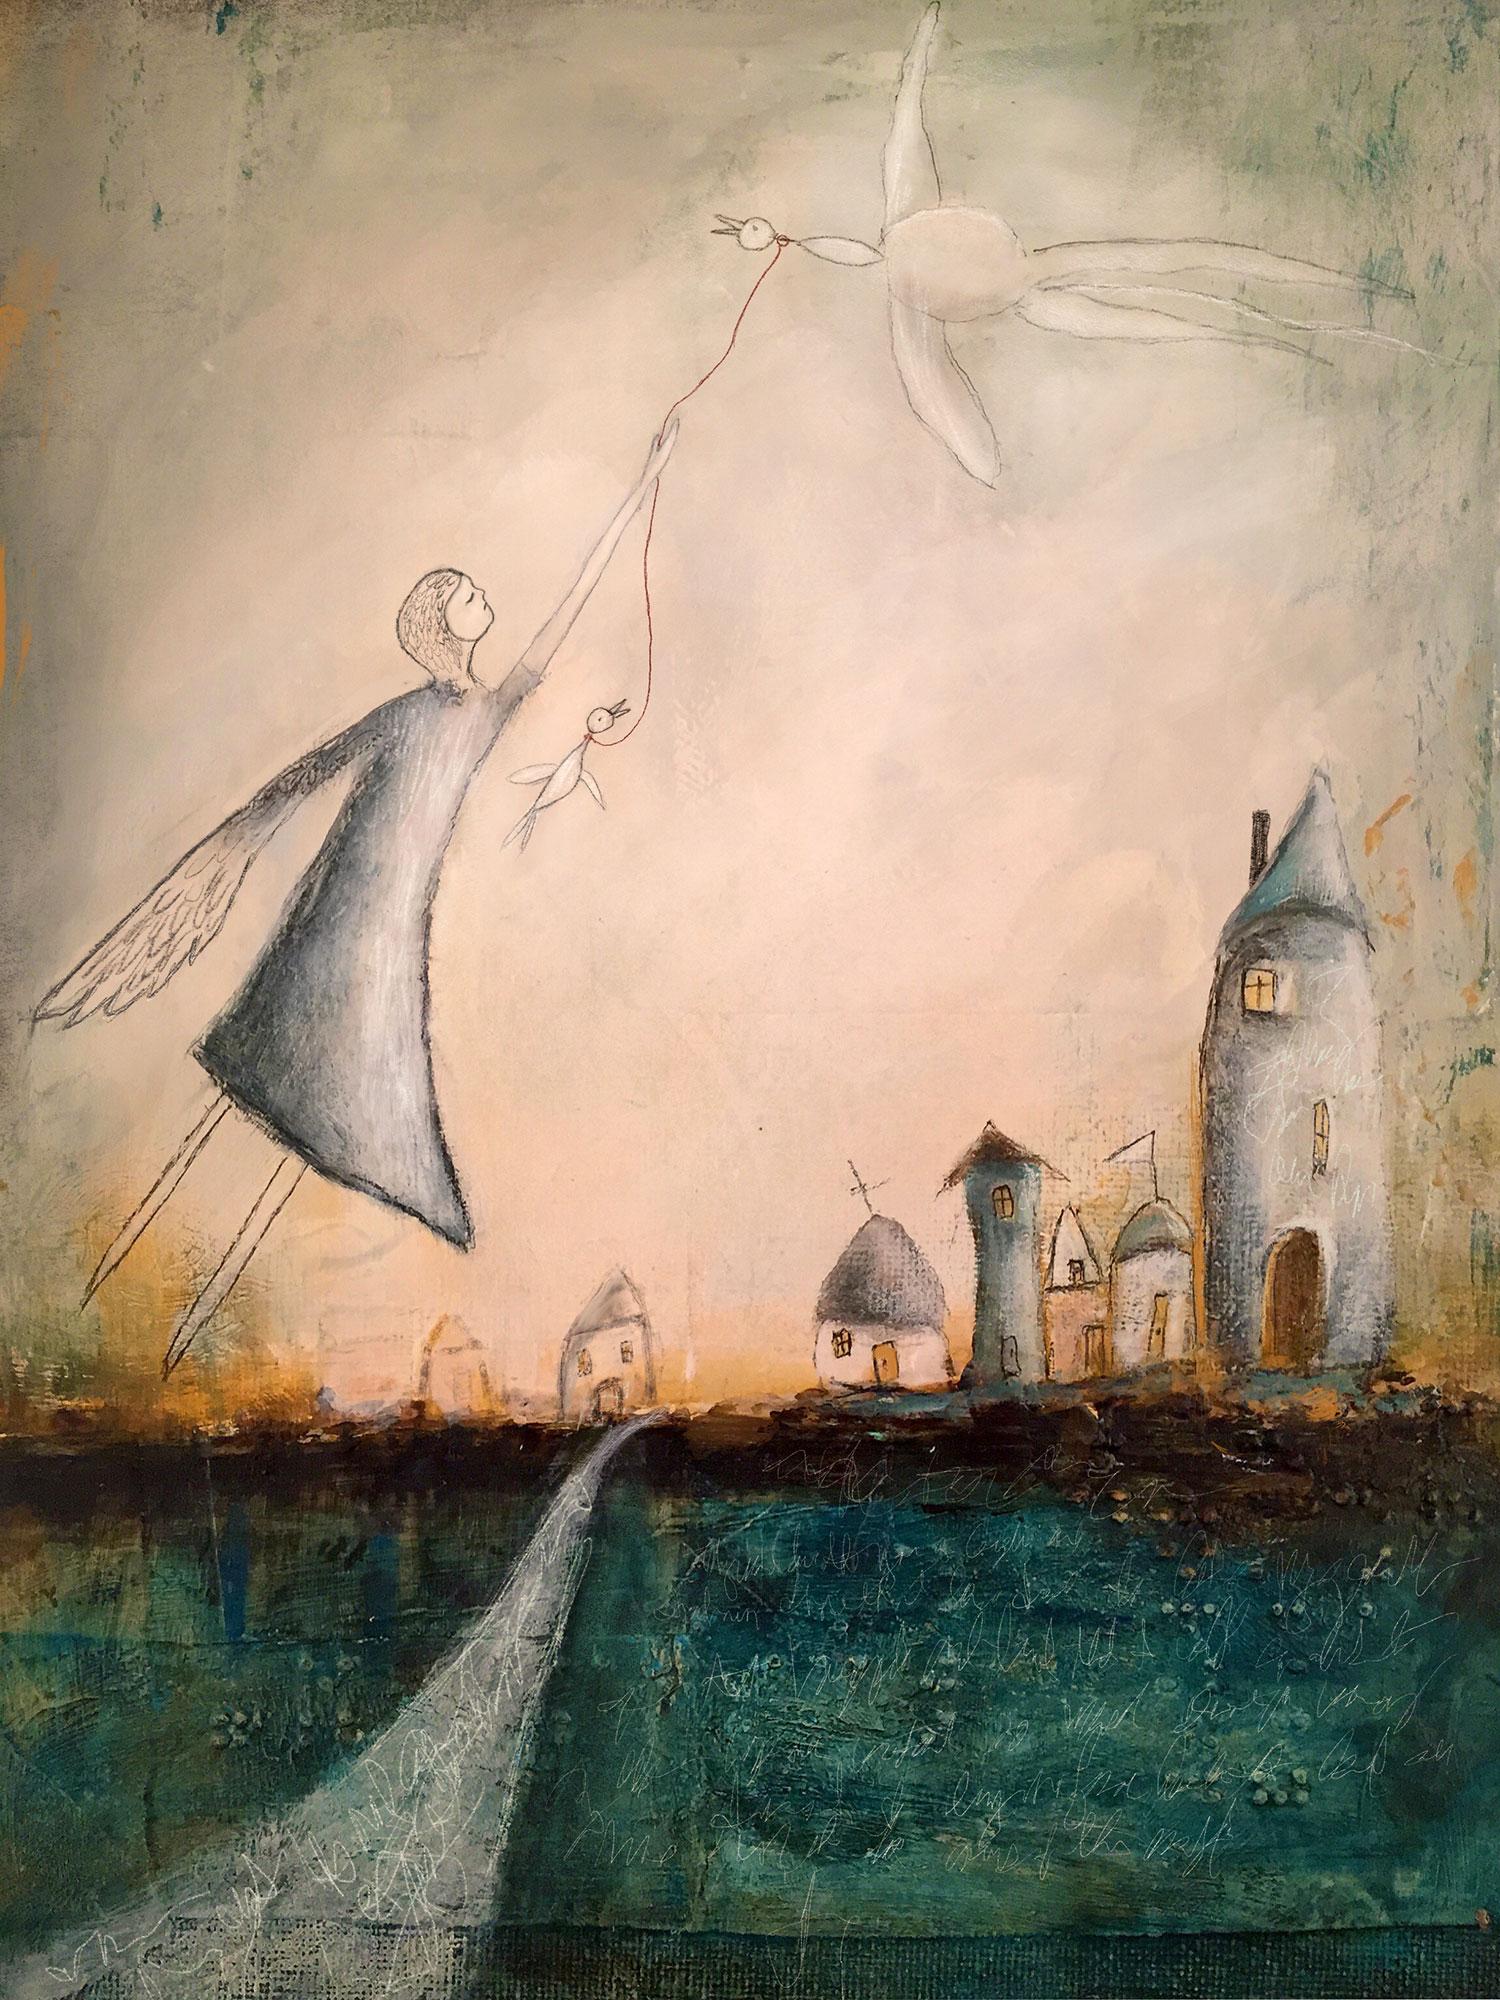 robin-laws-artist-storyboard